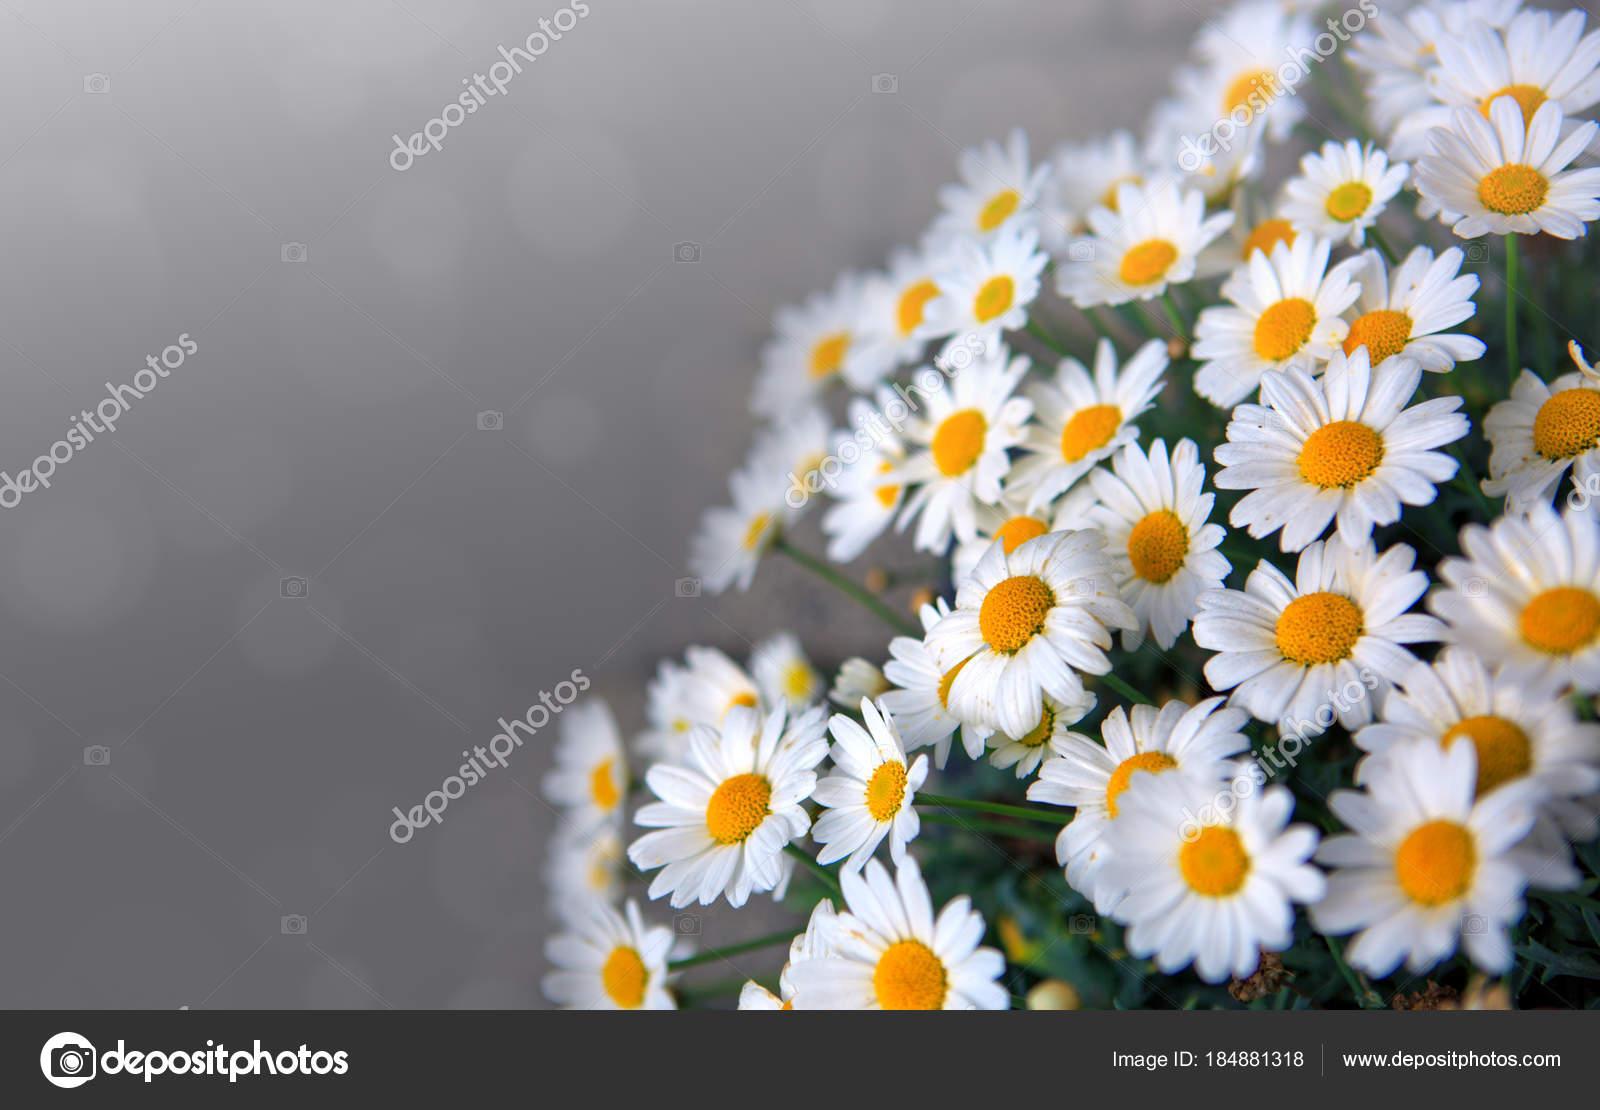 White Daisies Flowers In Bright Sun Light Stock Photo Swkunst